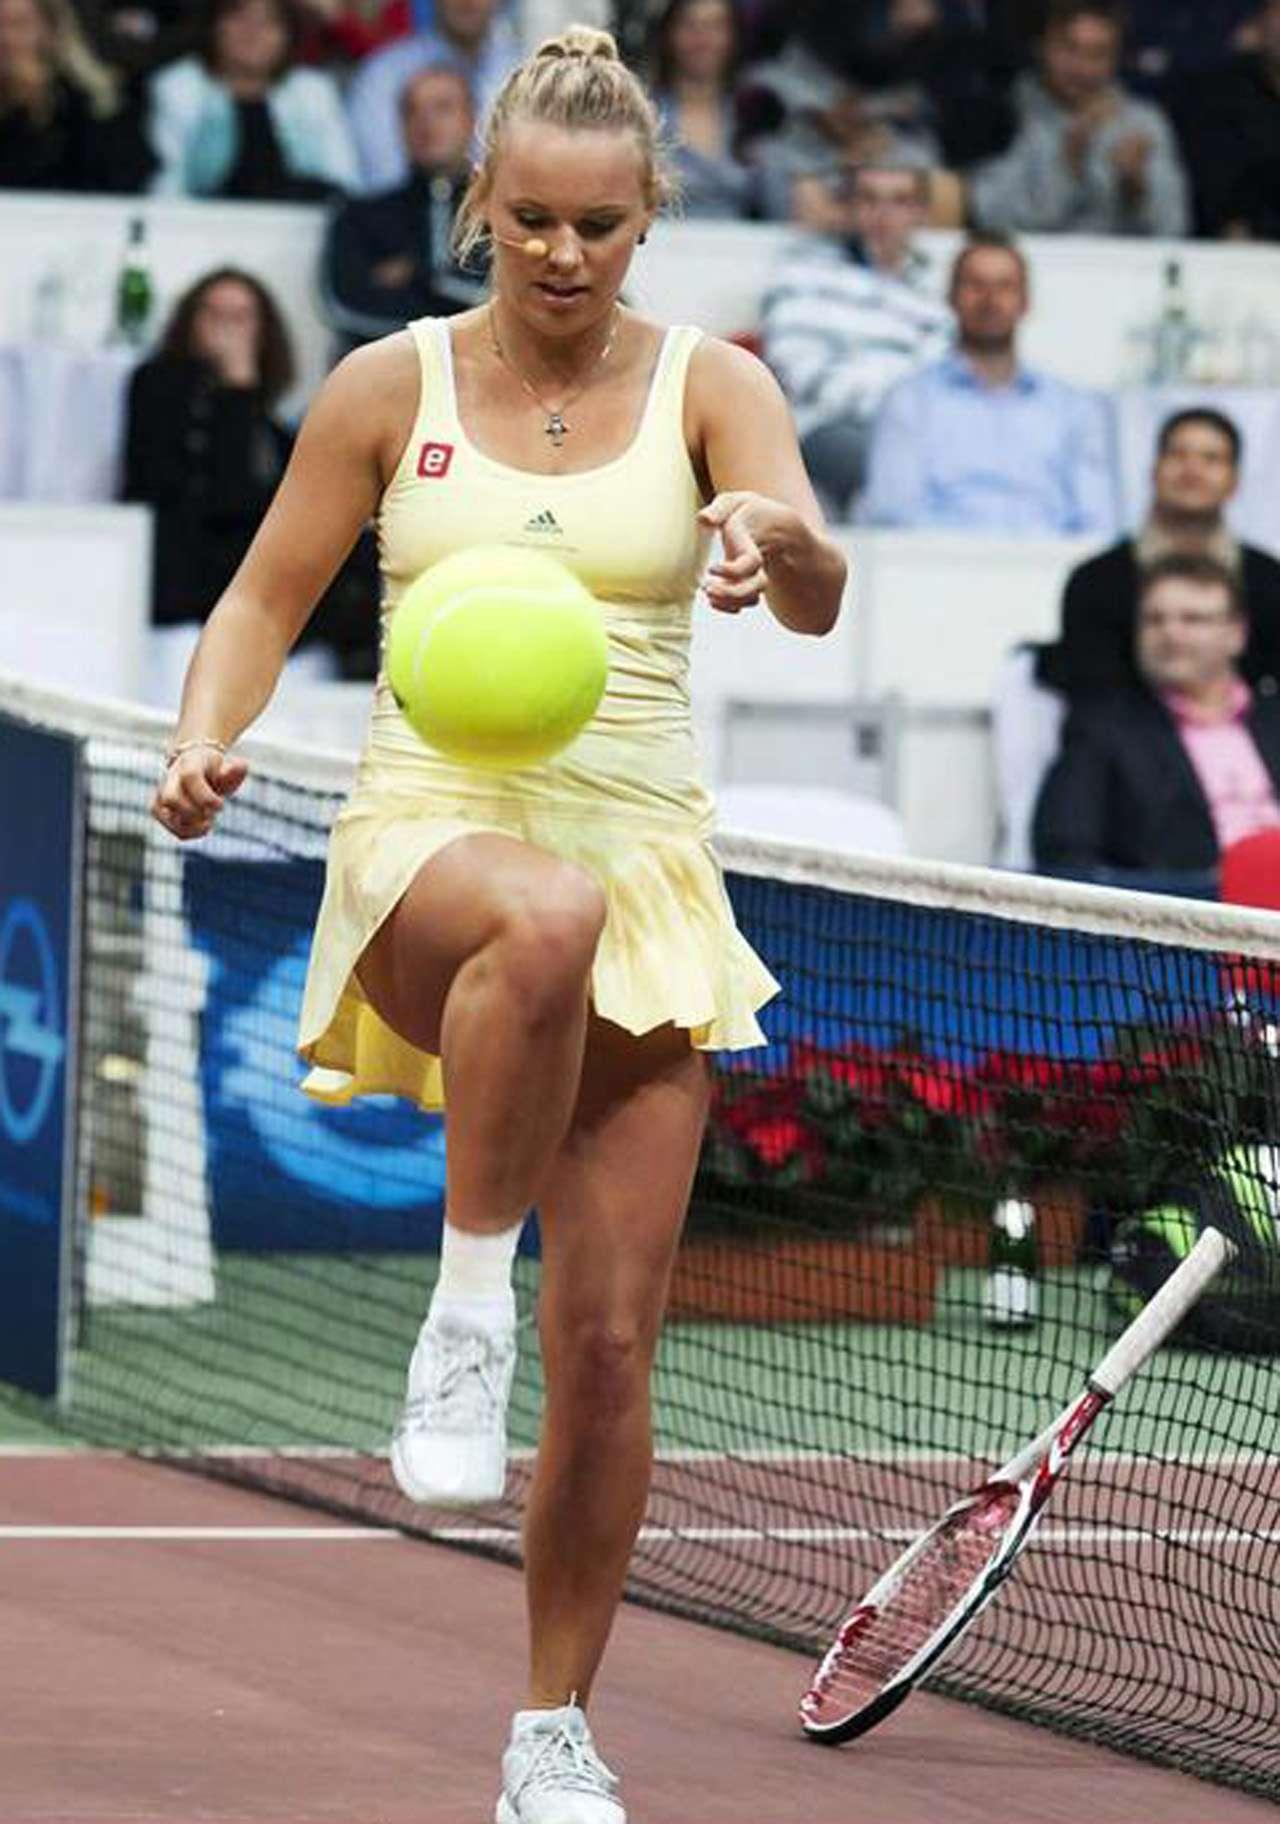 Wozniacki domina muy bien la pelota. Foto: Getty Images